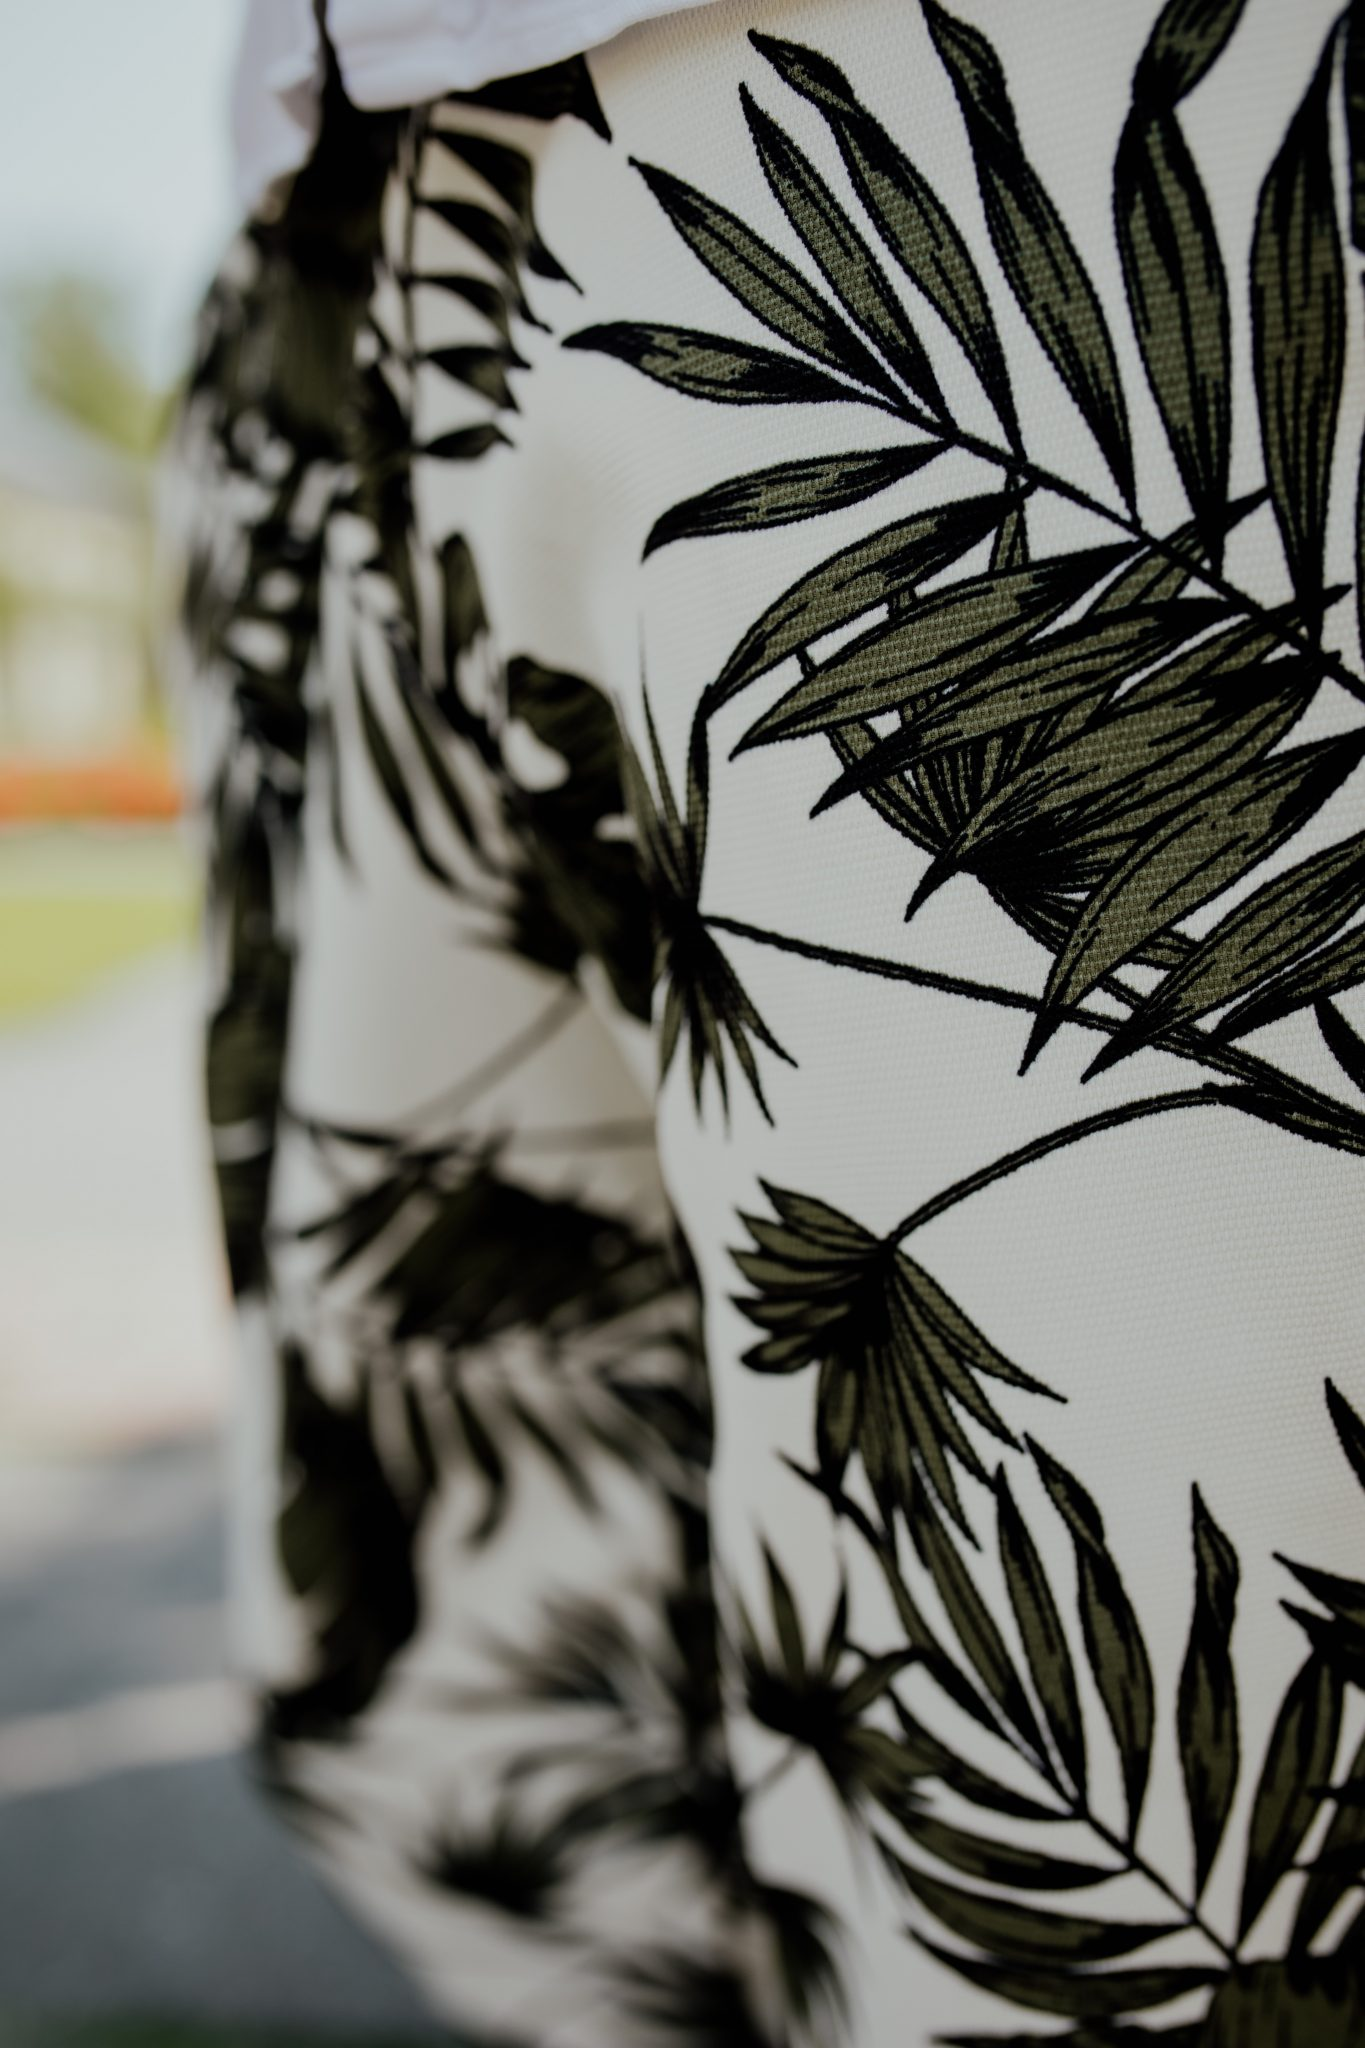 spodnie-m%C4%99skie-detal-print-tropikal